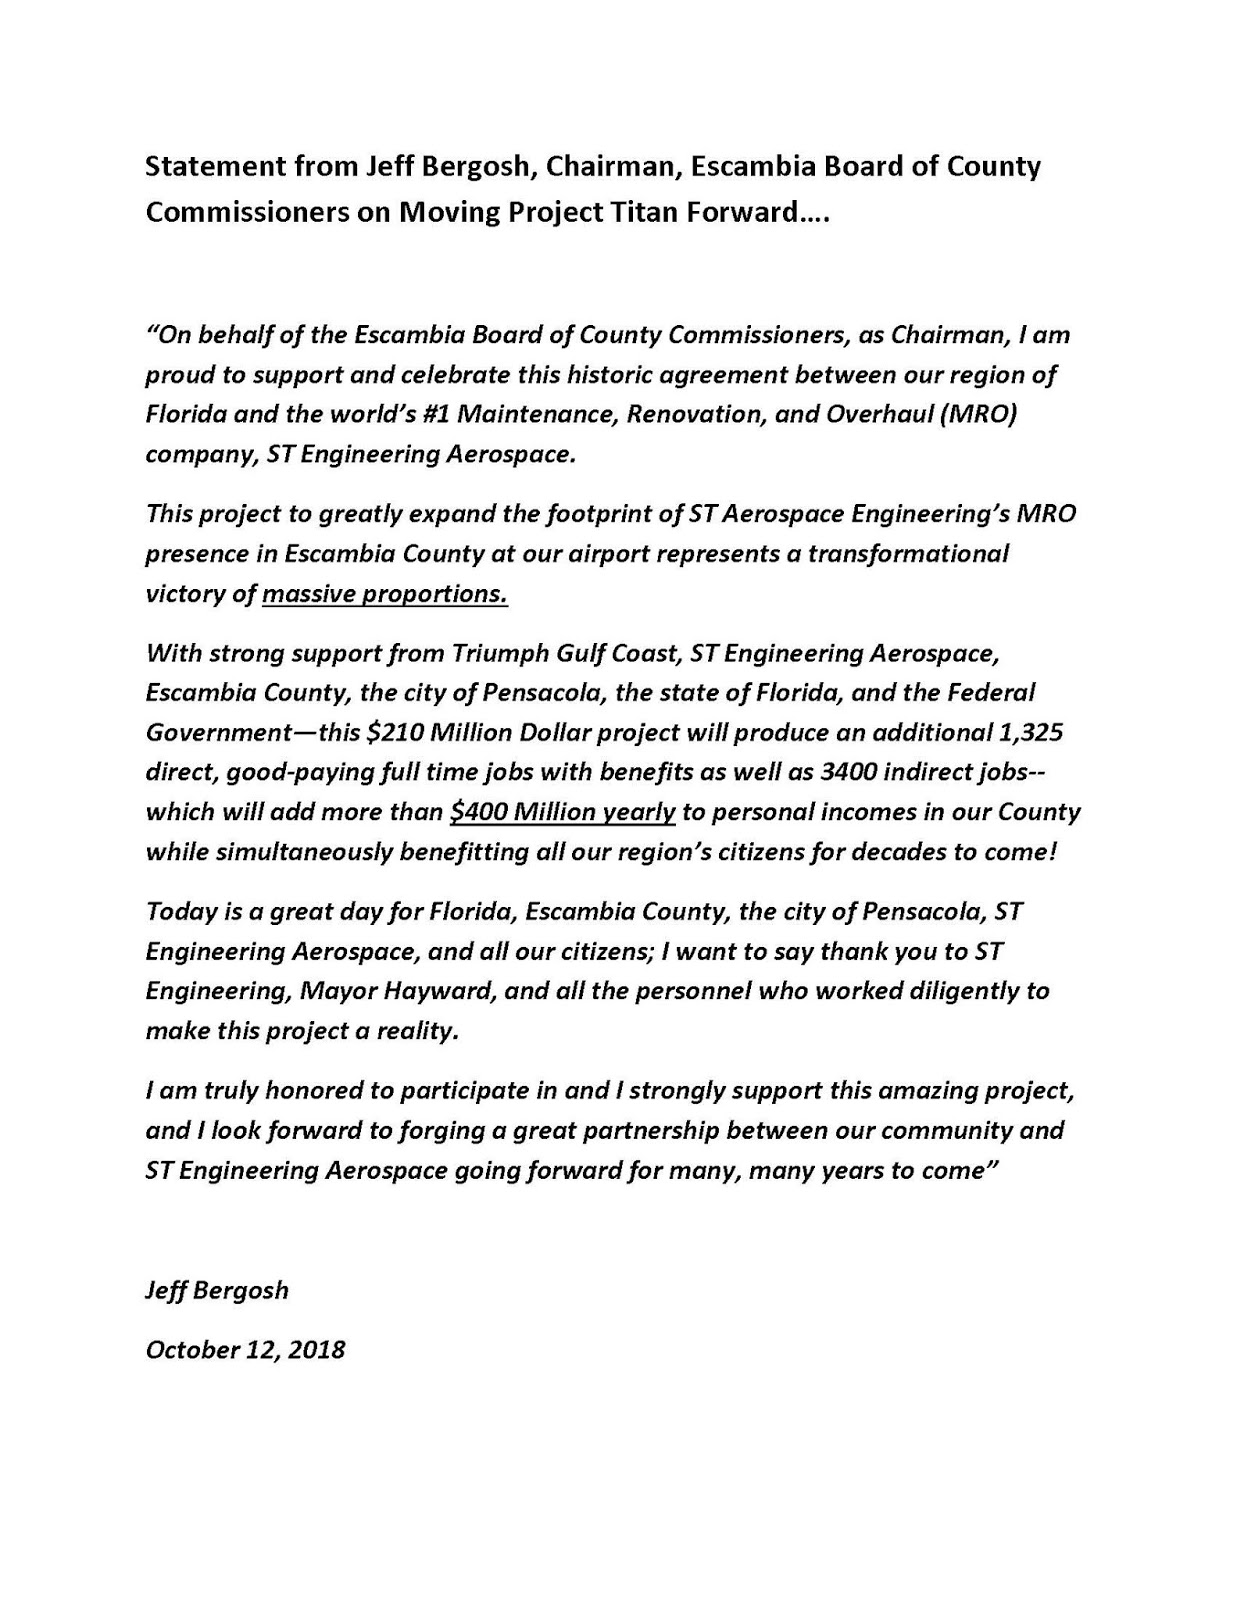 Jeff Bergosh Blog: Project Titan: Moving Forward to the